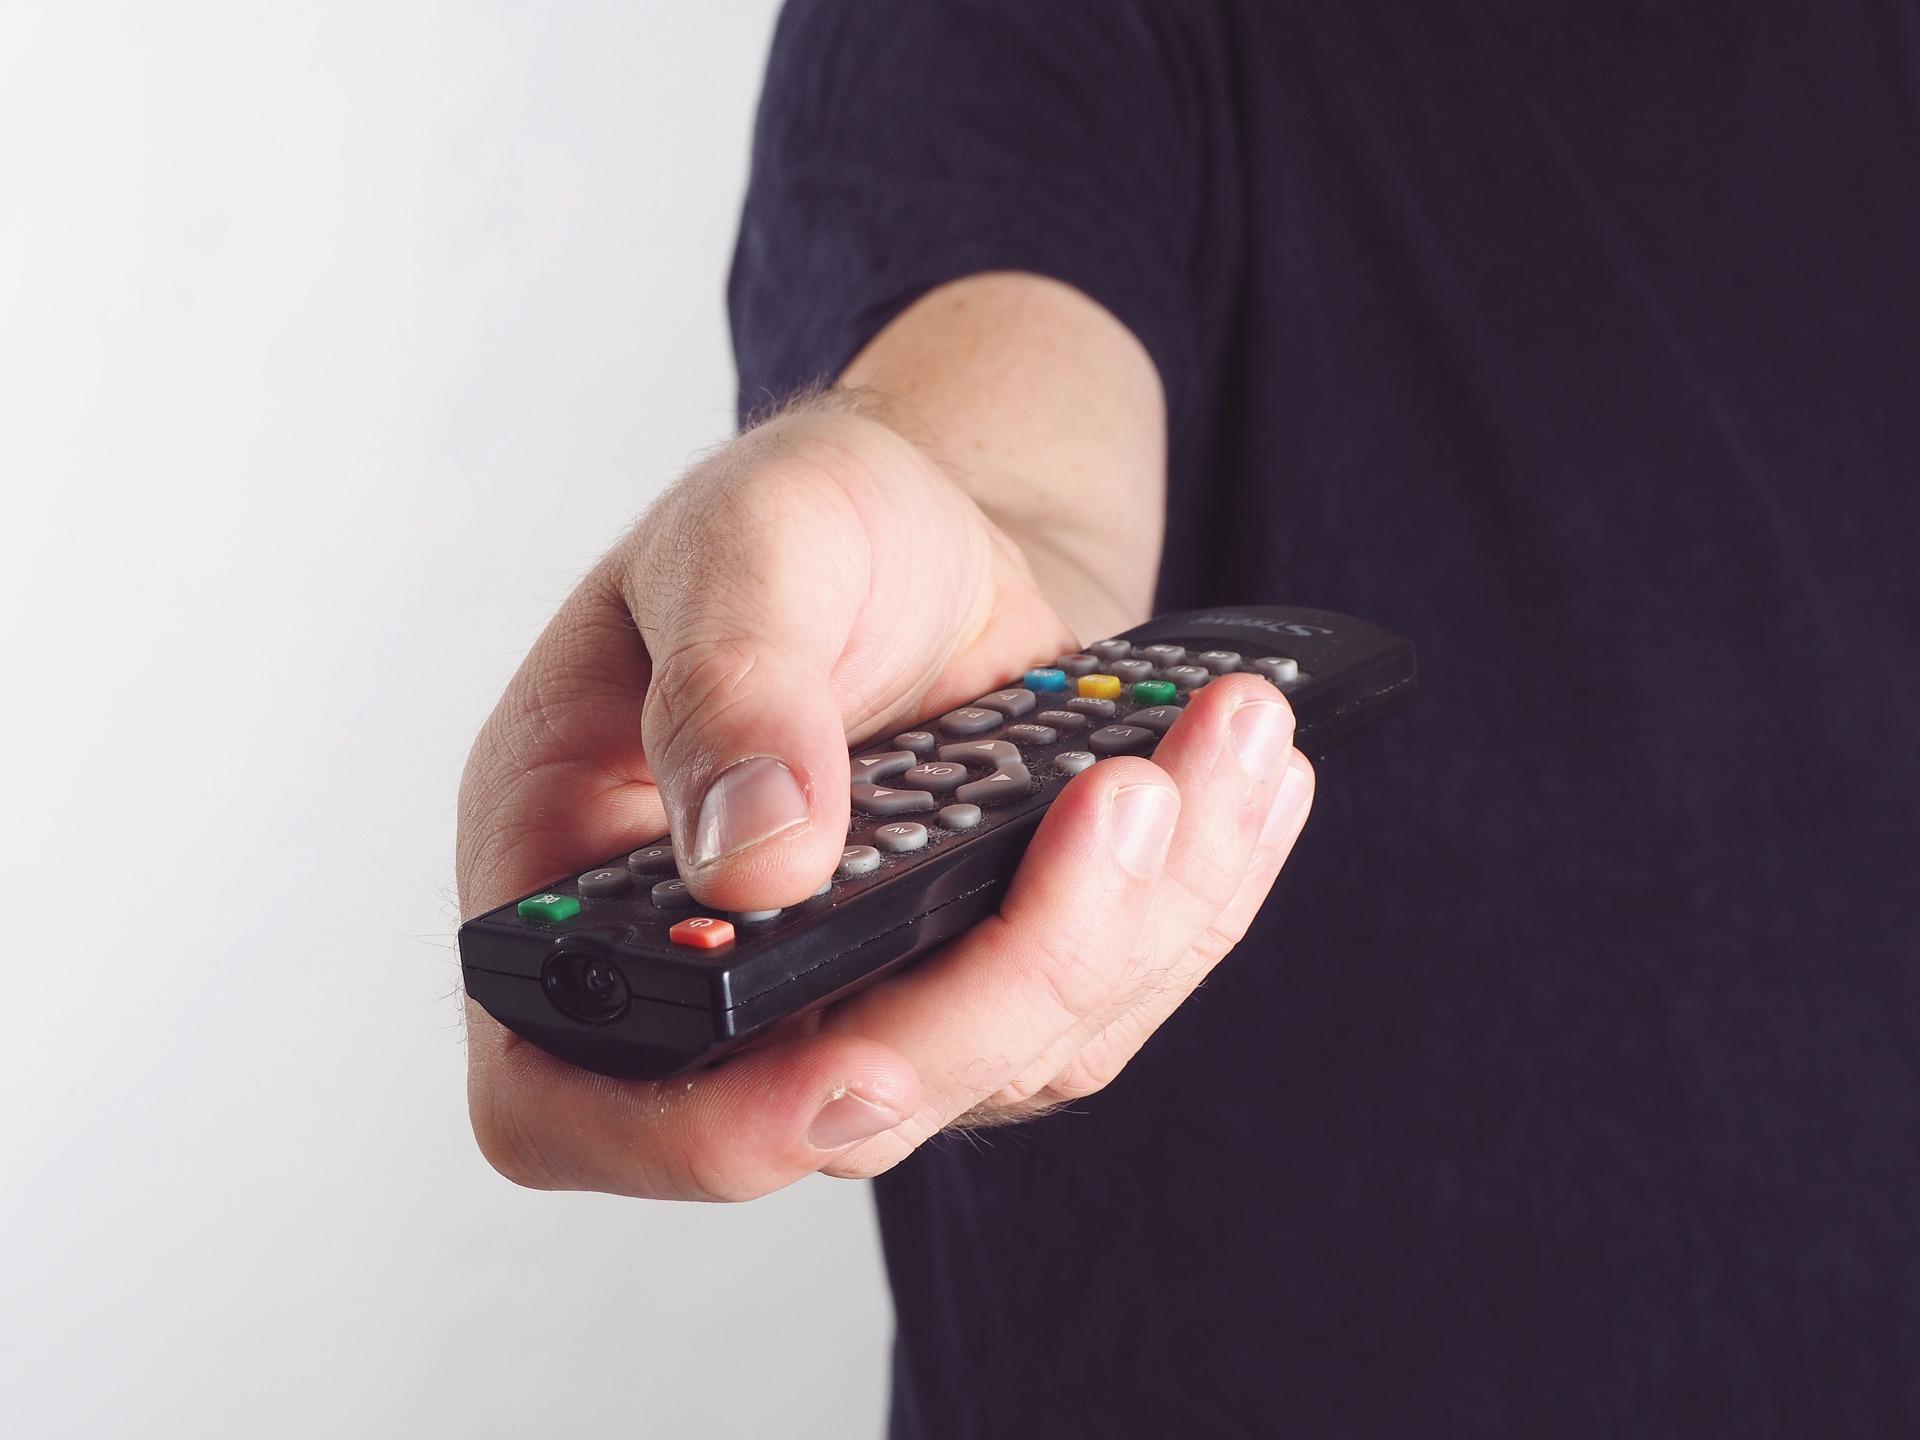 Programming Dish Remote To TV